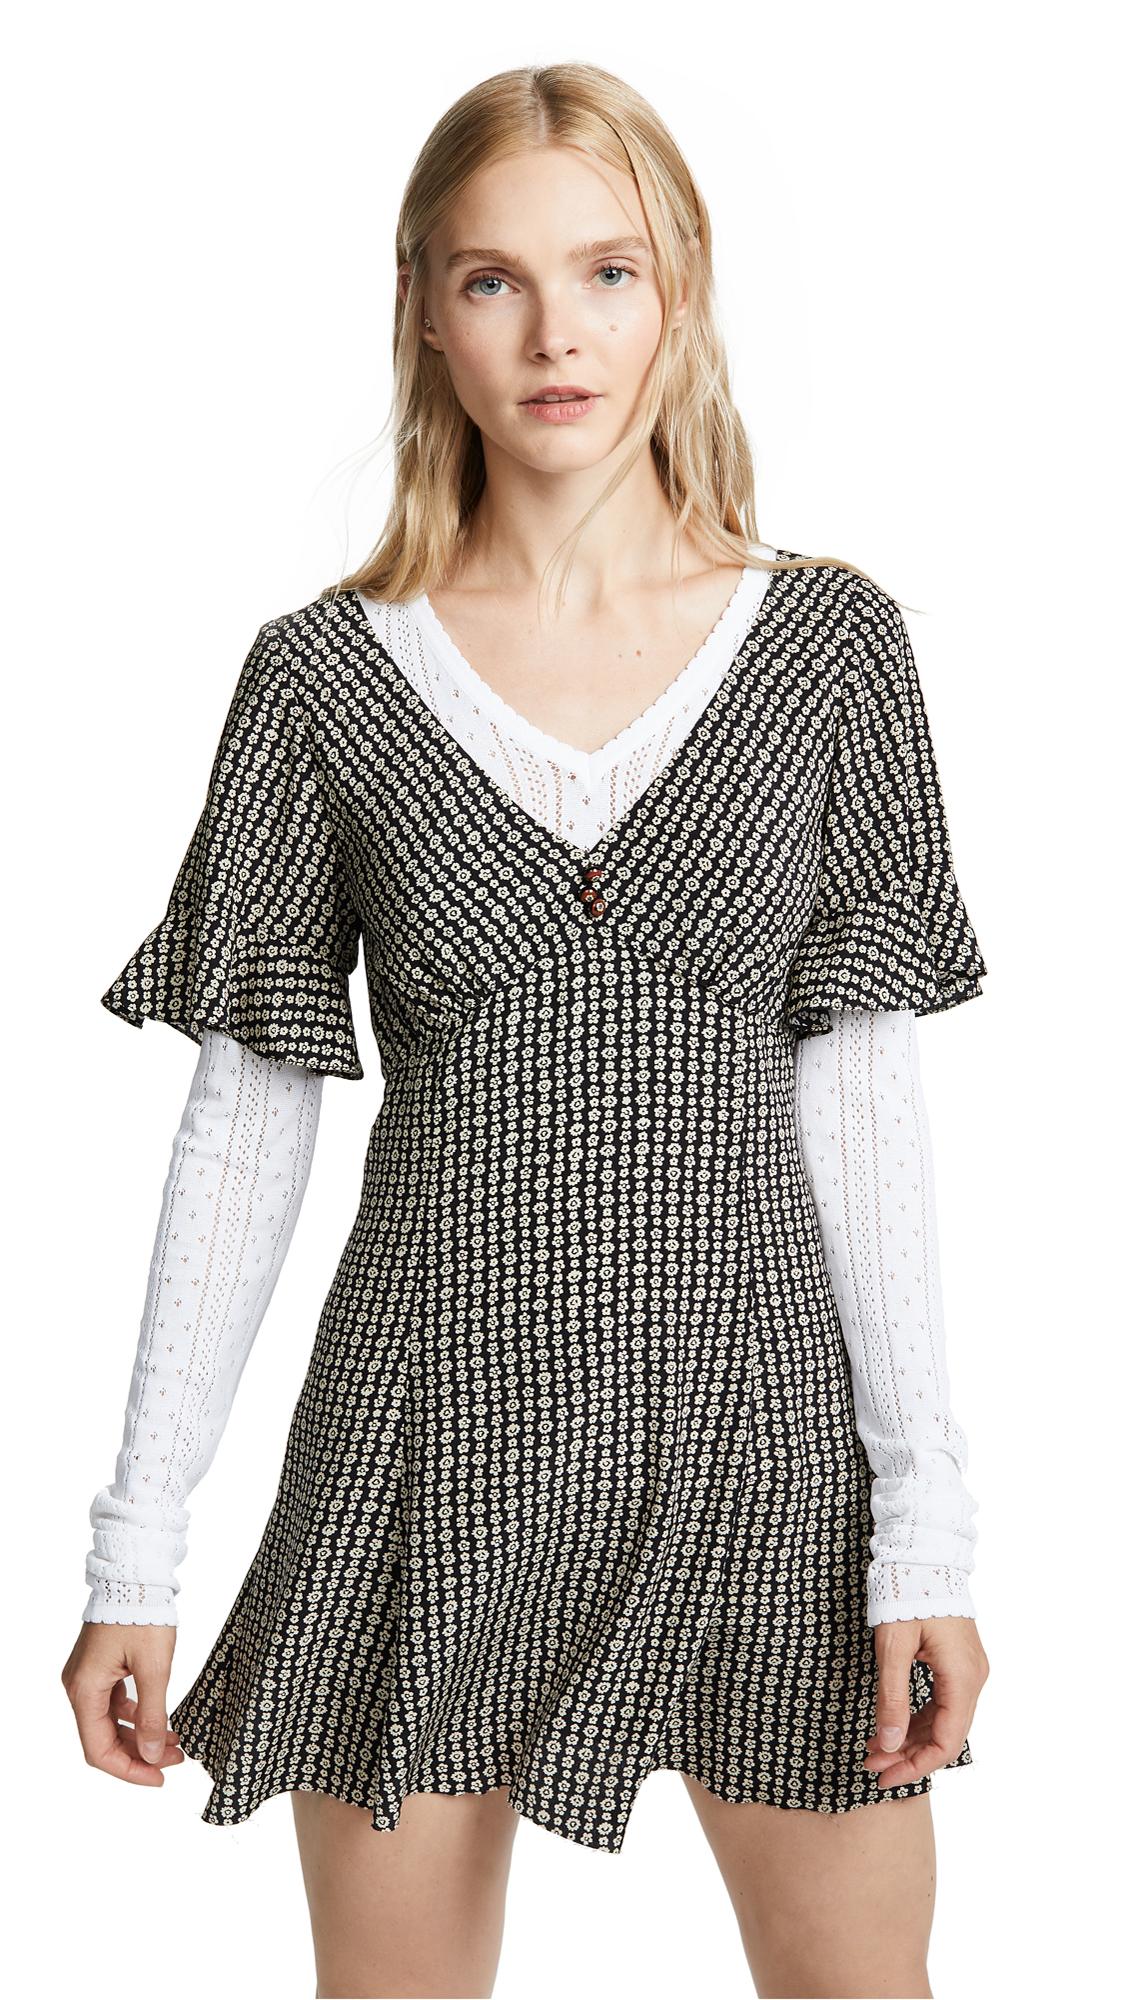 Marc Jacobs Redux Grunge Short Sleeve Mini Dress - Black Multi